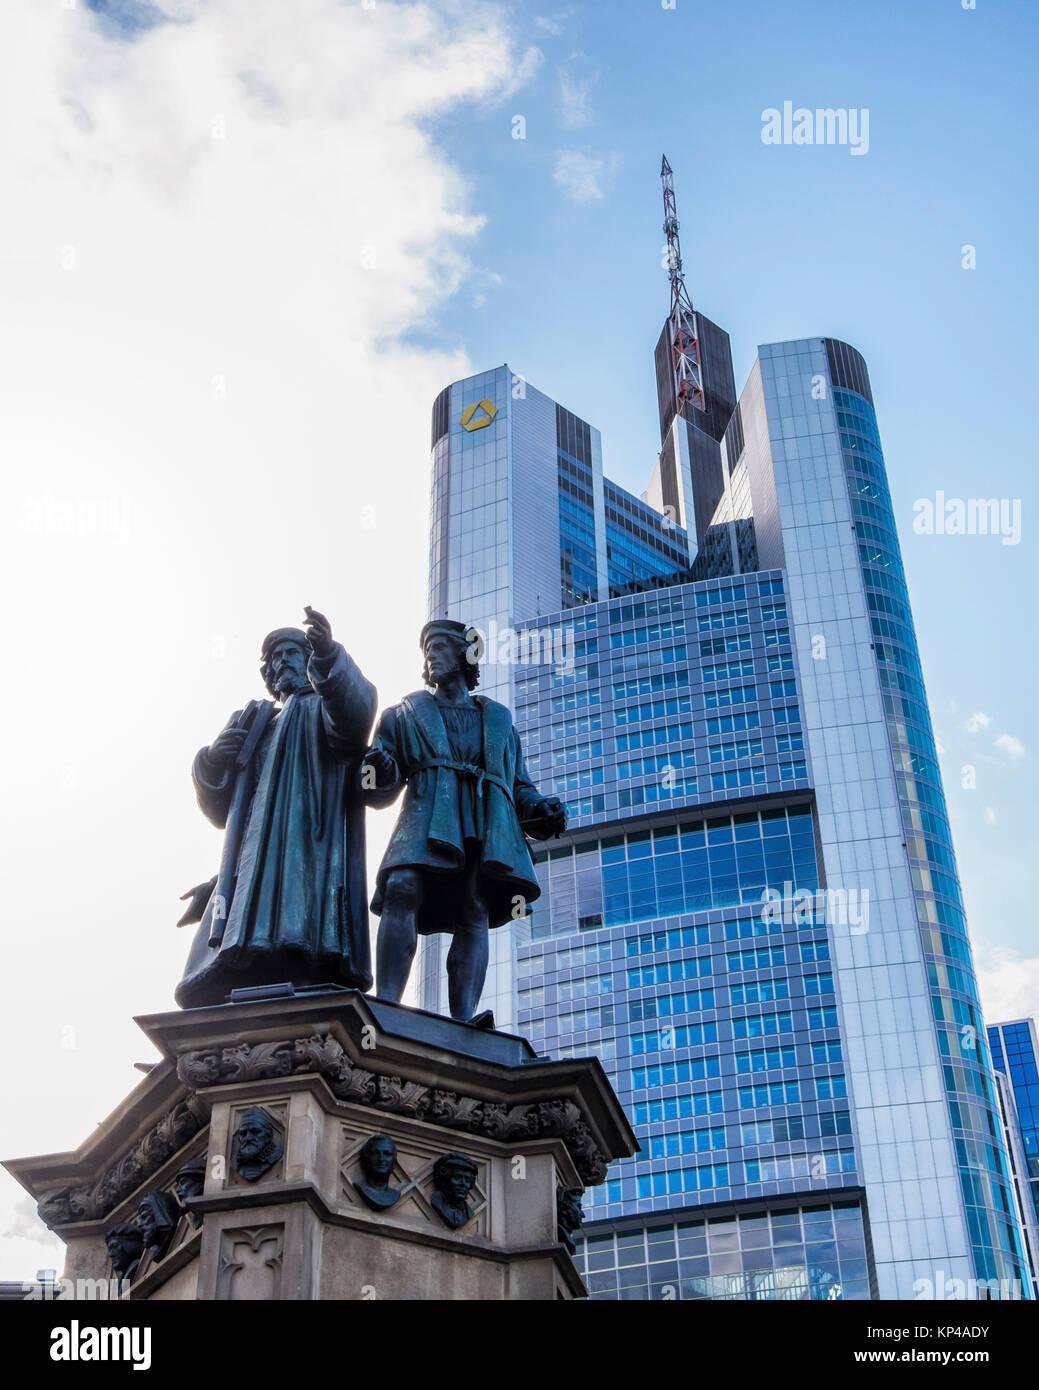 Frankfurt,Rossmarkt square. Johannes Gutenberg memorial statue honours the inventor of the printing press in front - Stock Image